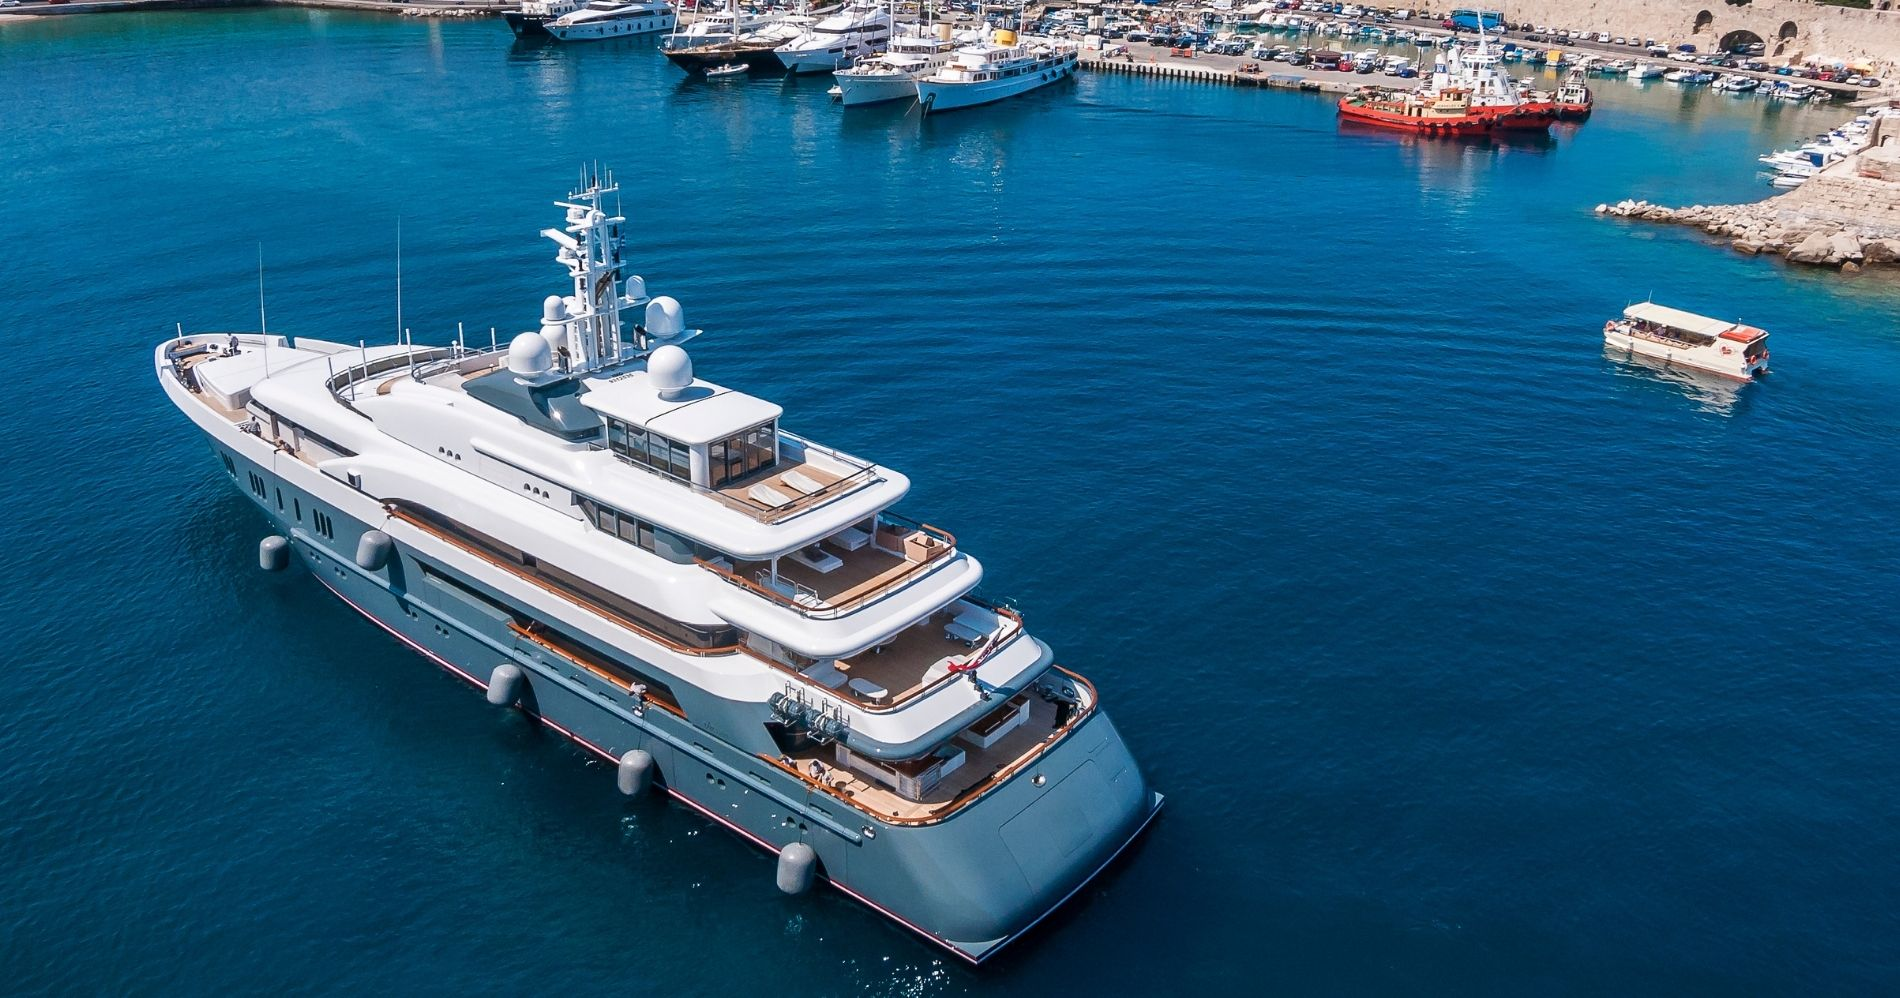 Penjualan Superyacht Meningkat Illustration Web Bisnis Muda - Canva